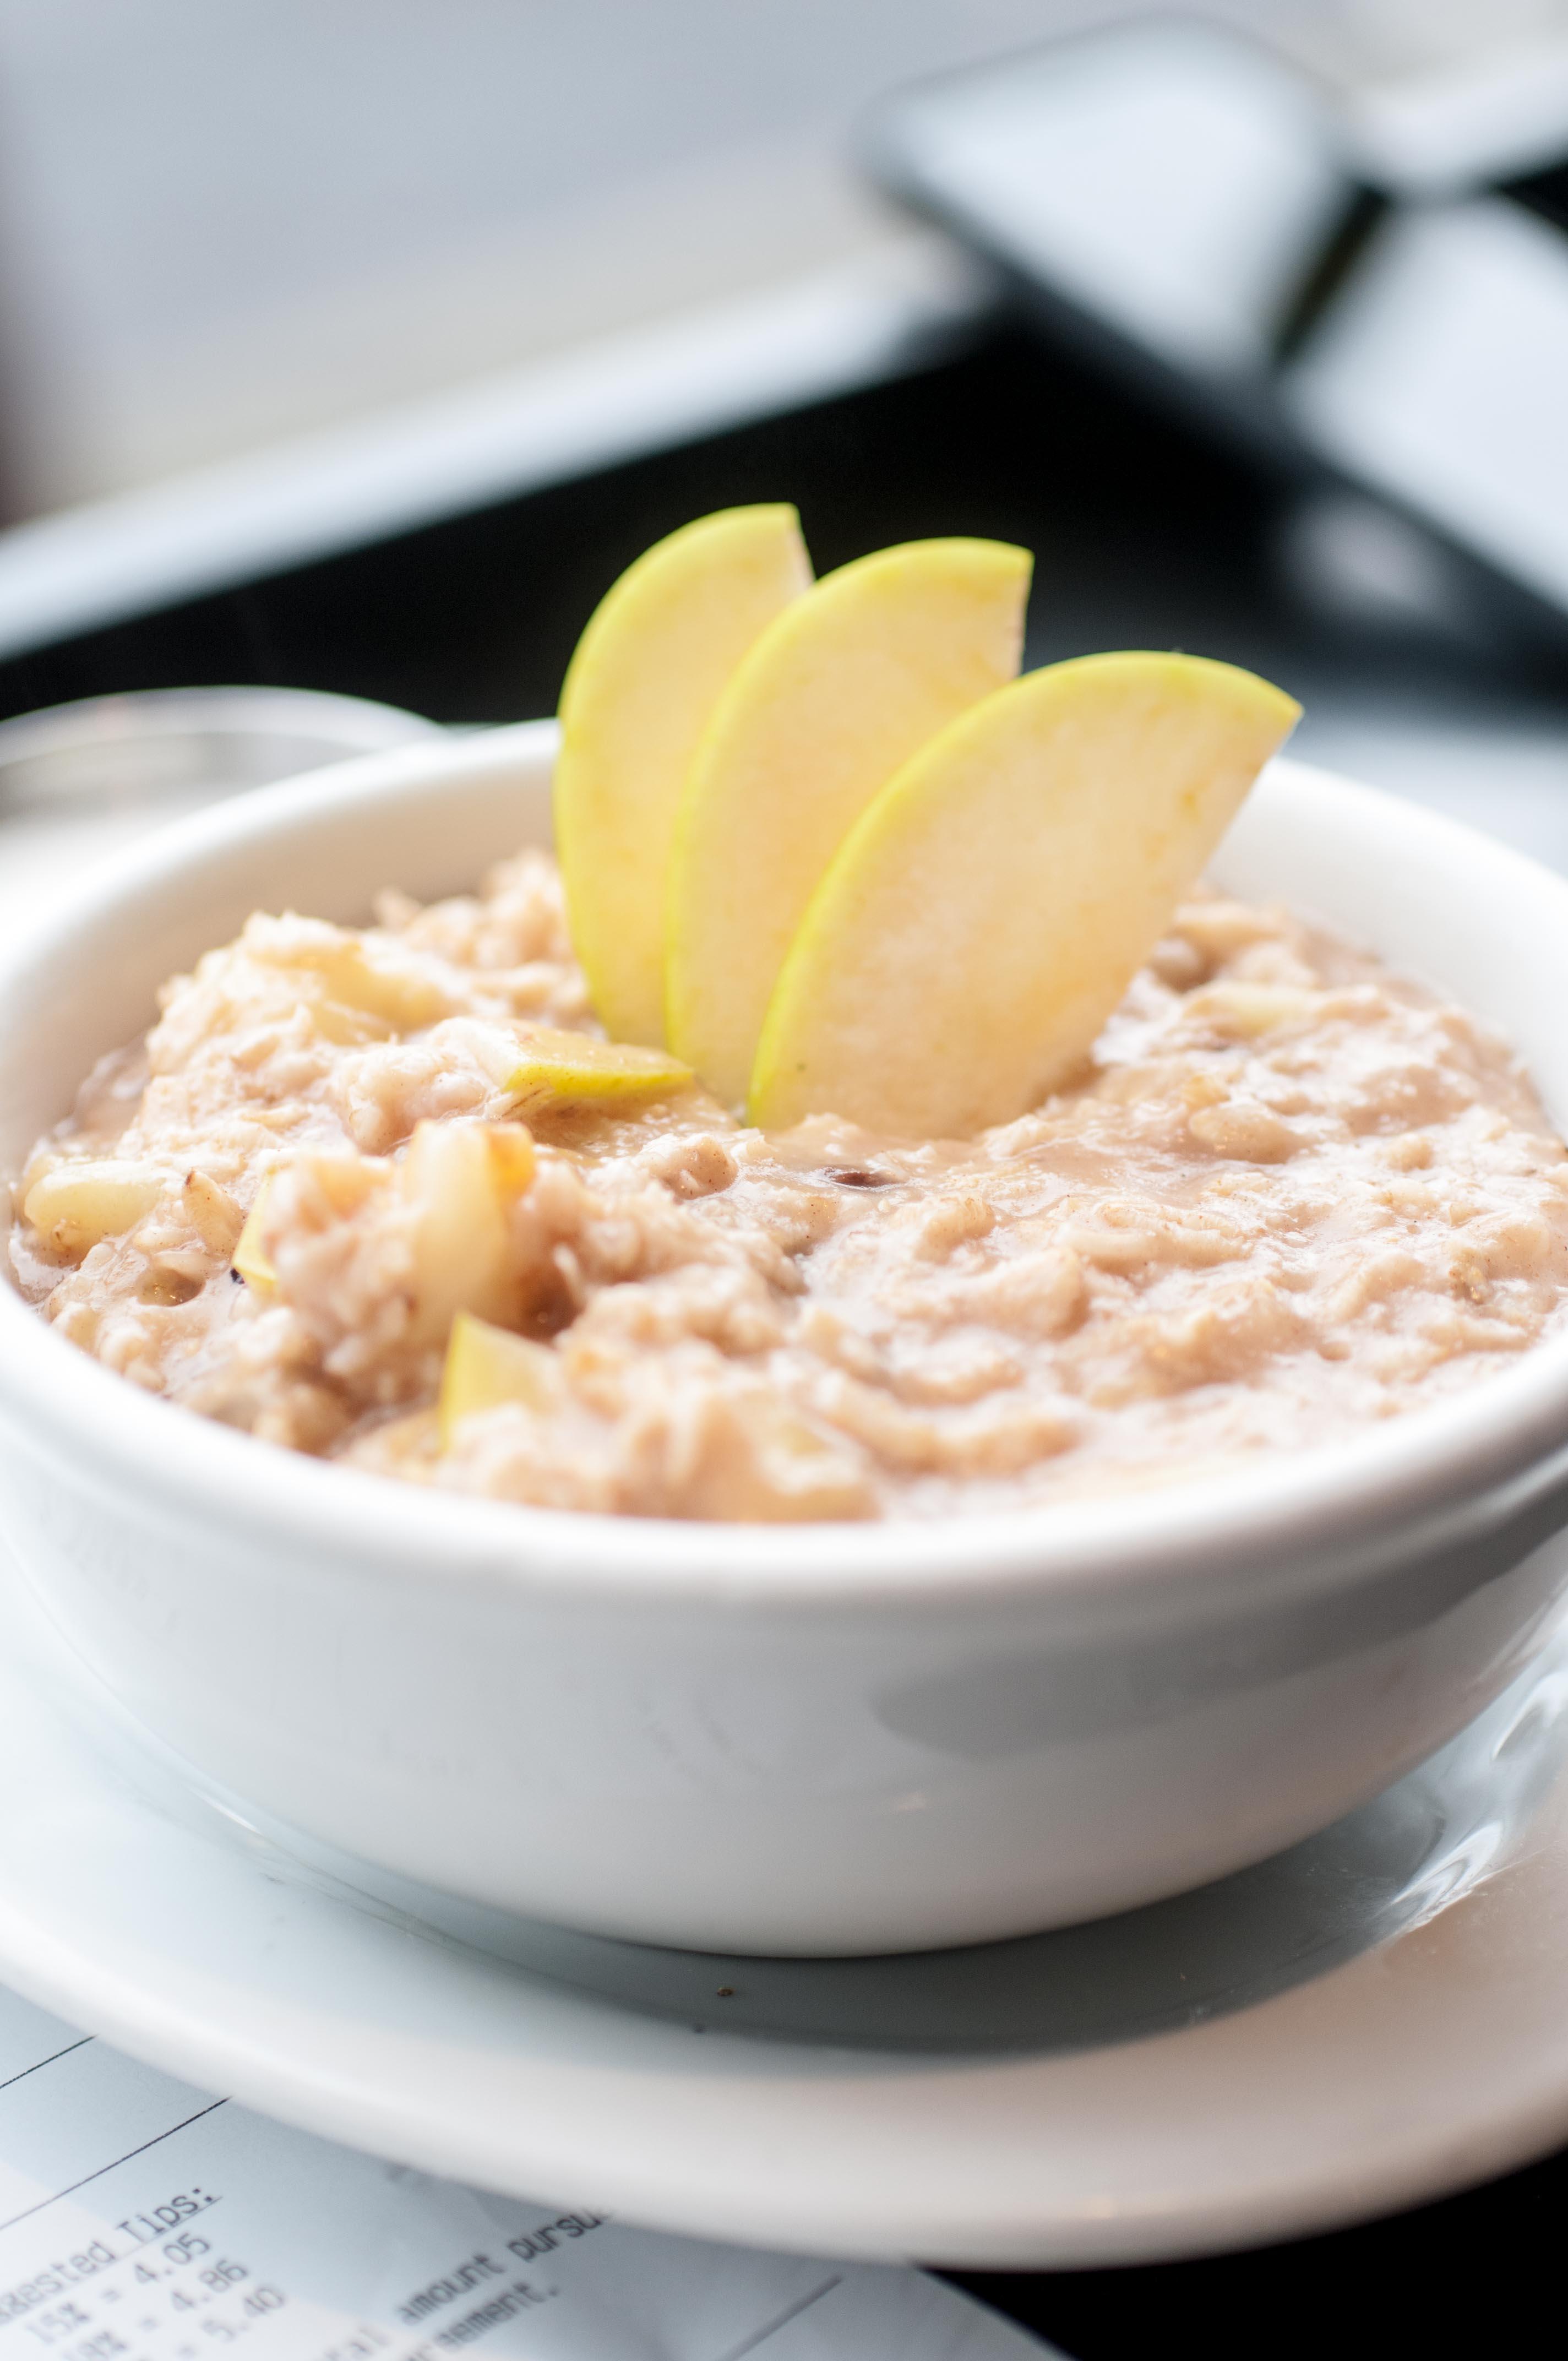 Hot oatmeal Harlow Portland